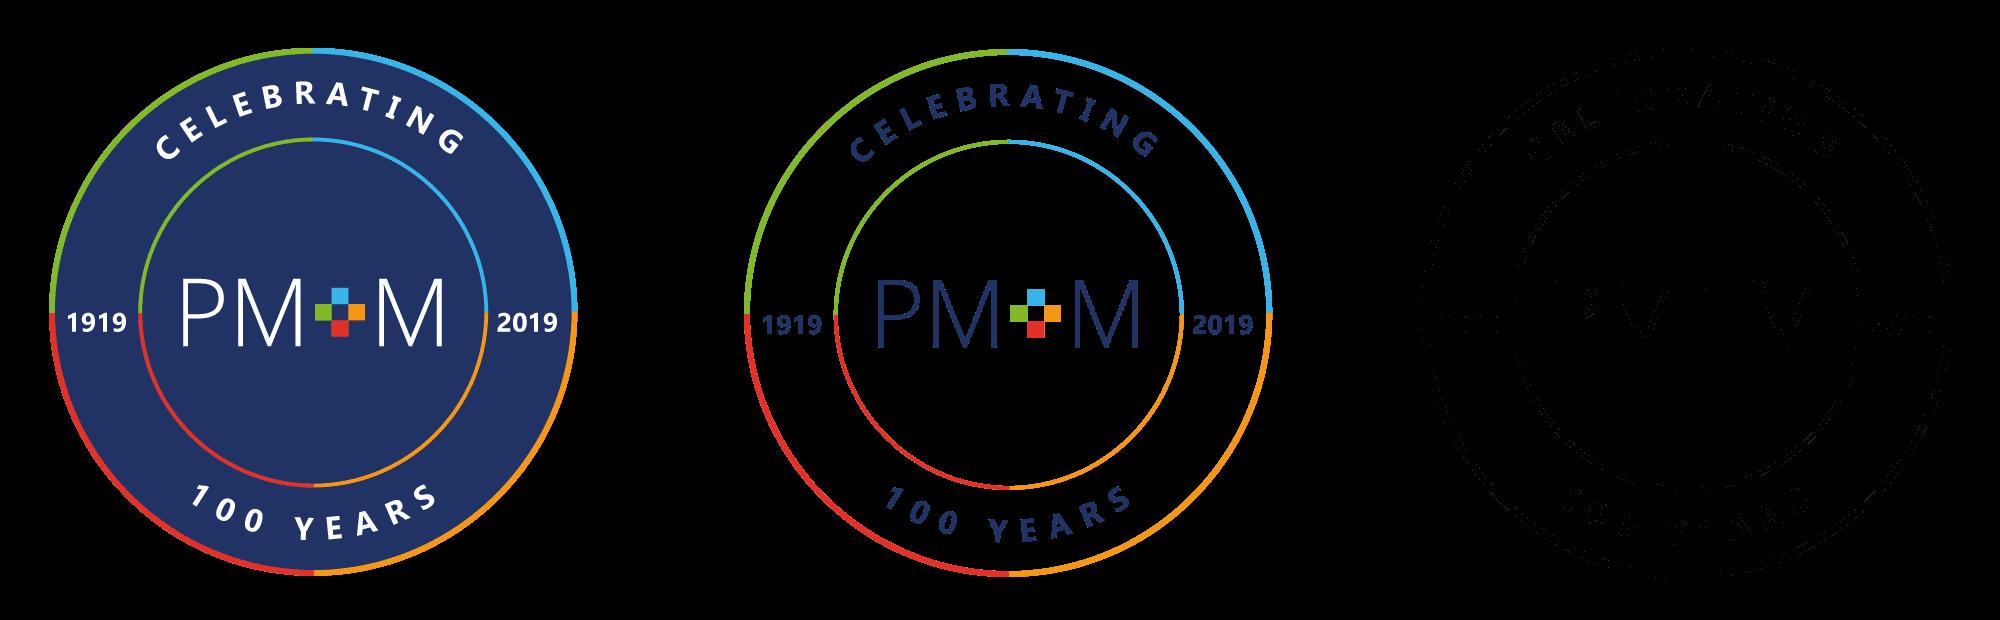 PM+M - Branding